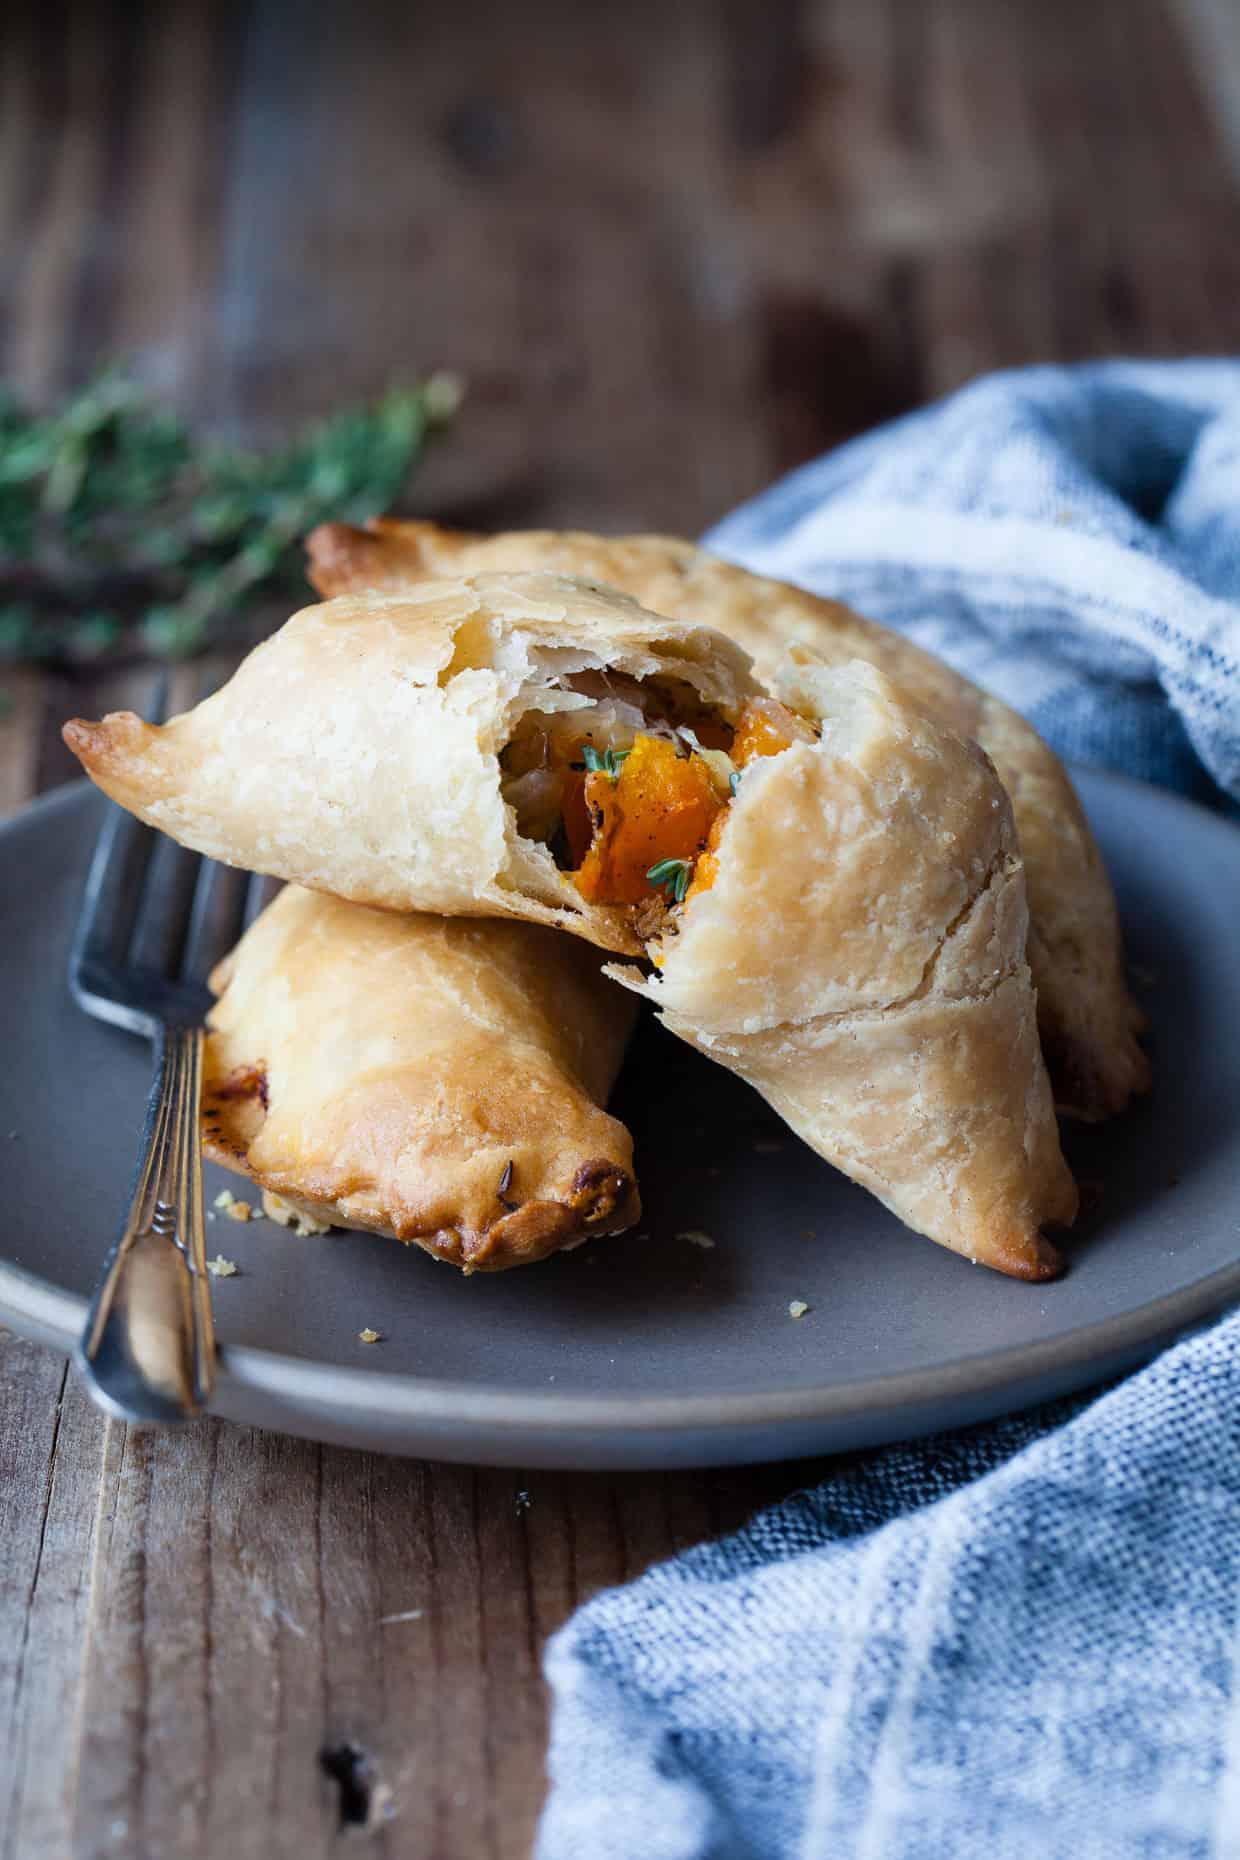 Gluten-free Kabocha Empanadas with Gruyère & Thyme